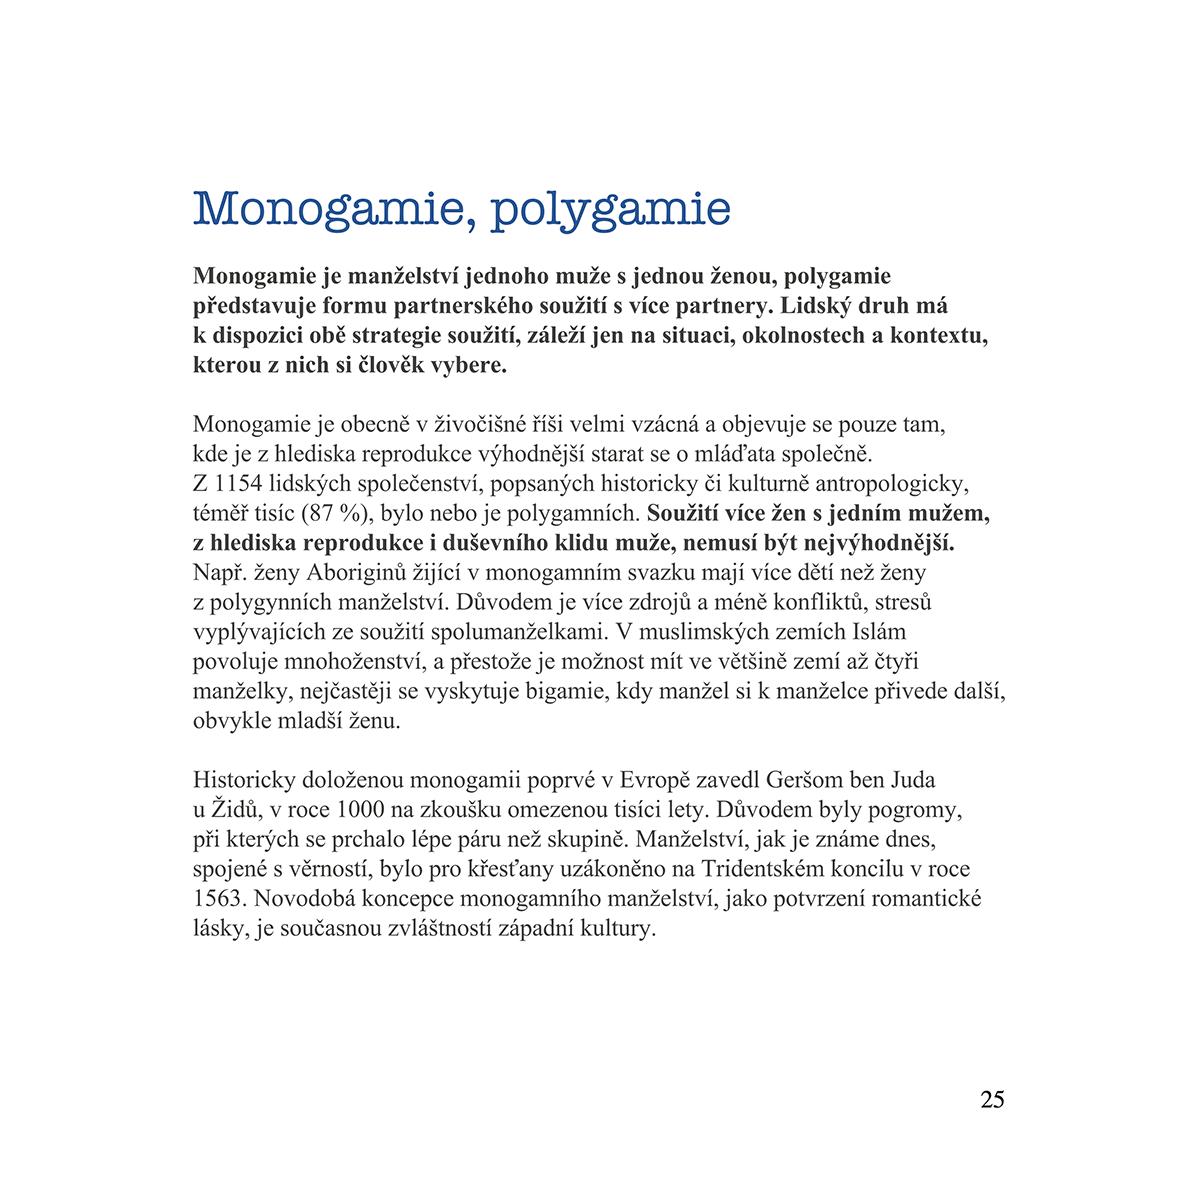 ukazka 9